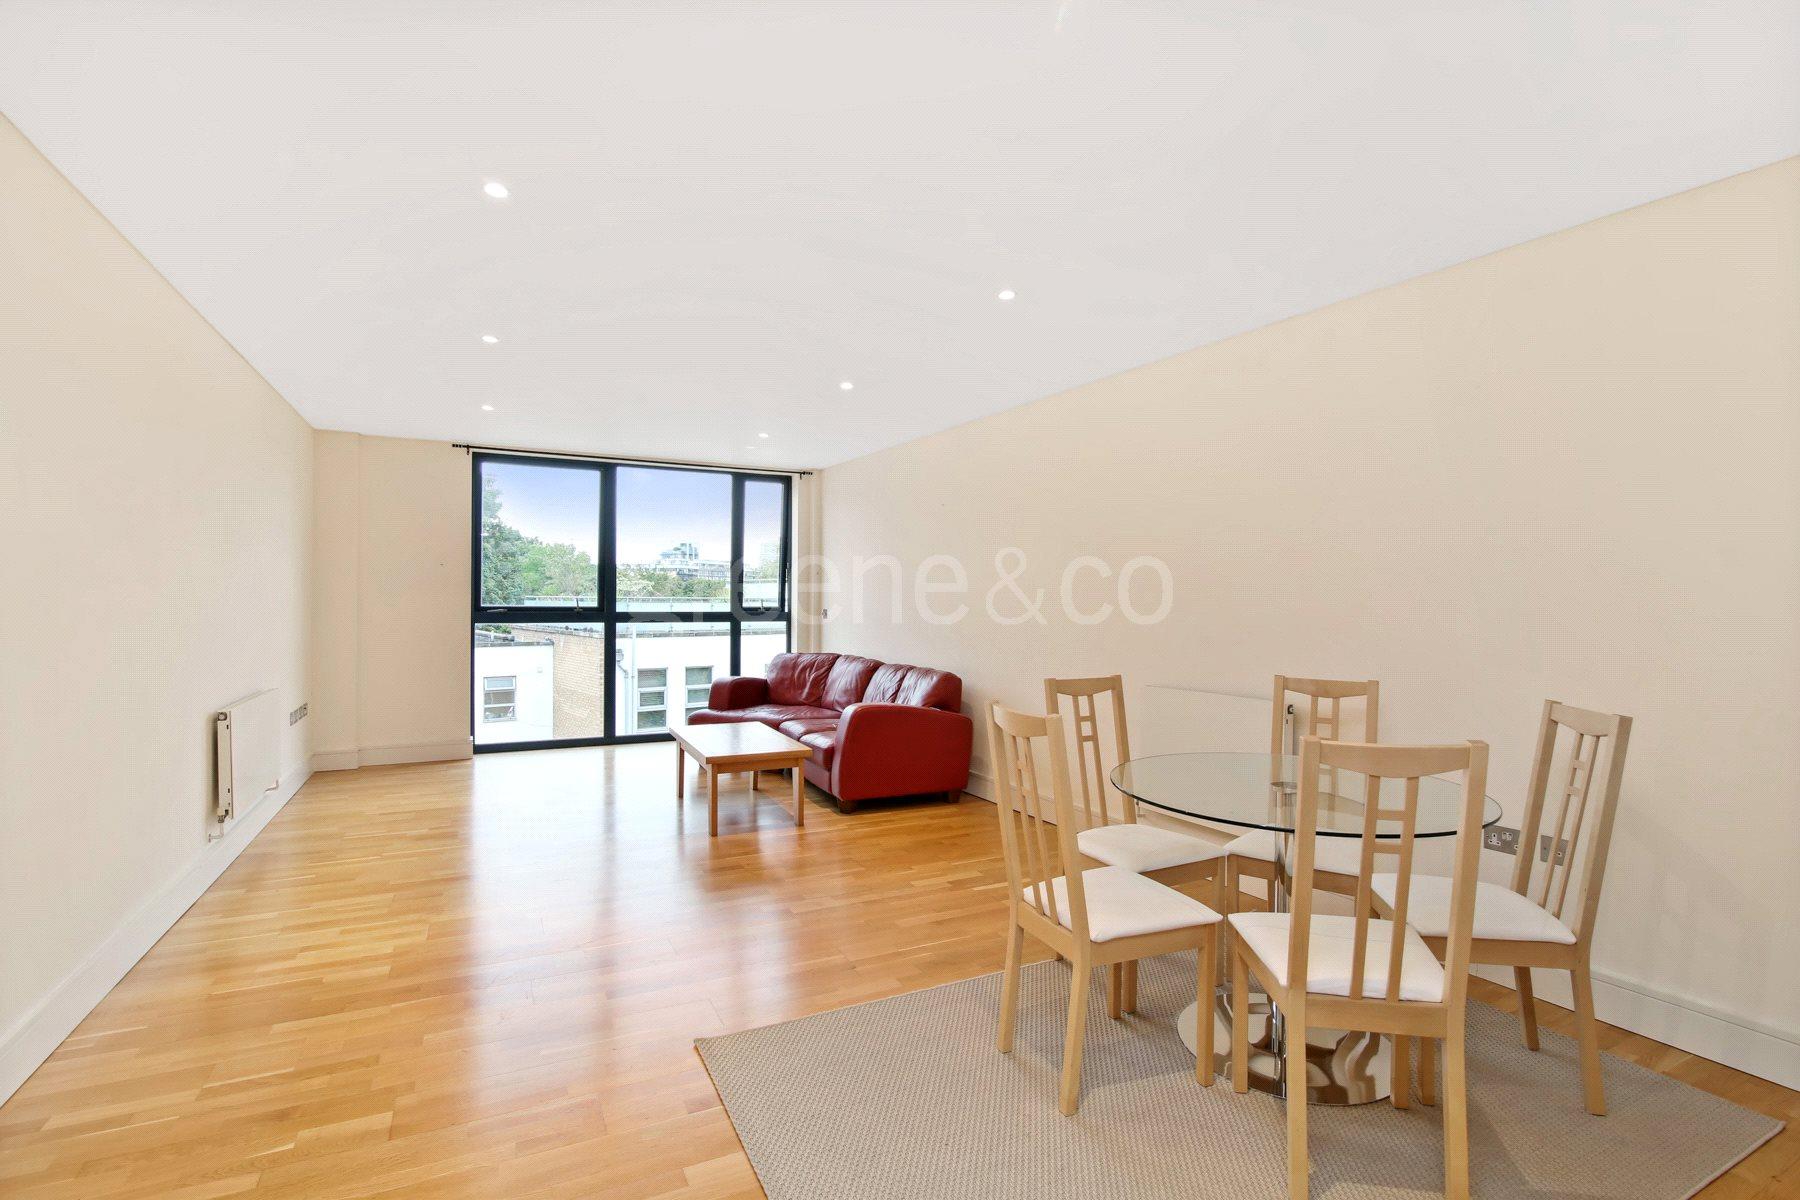 1 Bedroom House for sale in Trafalgar Point, 137 Downham Road, London, N1